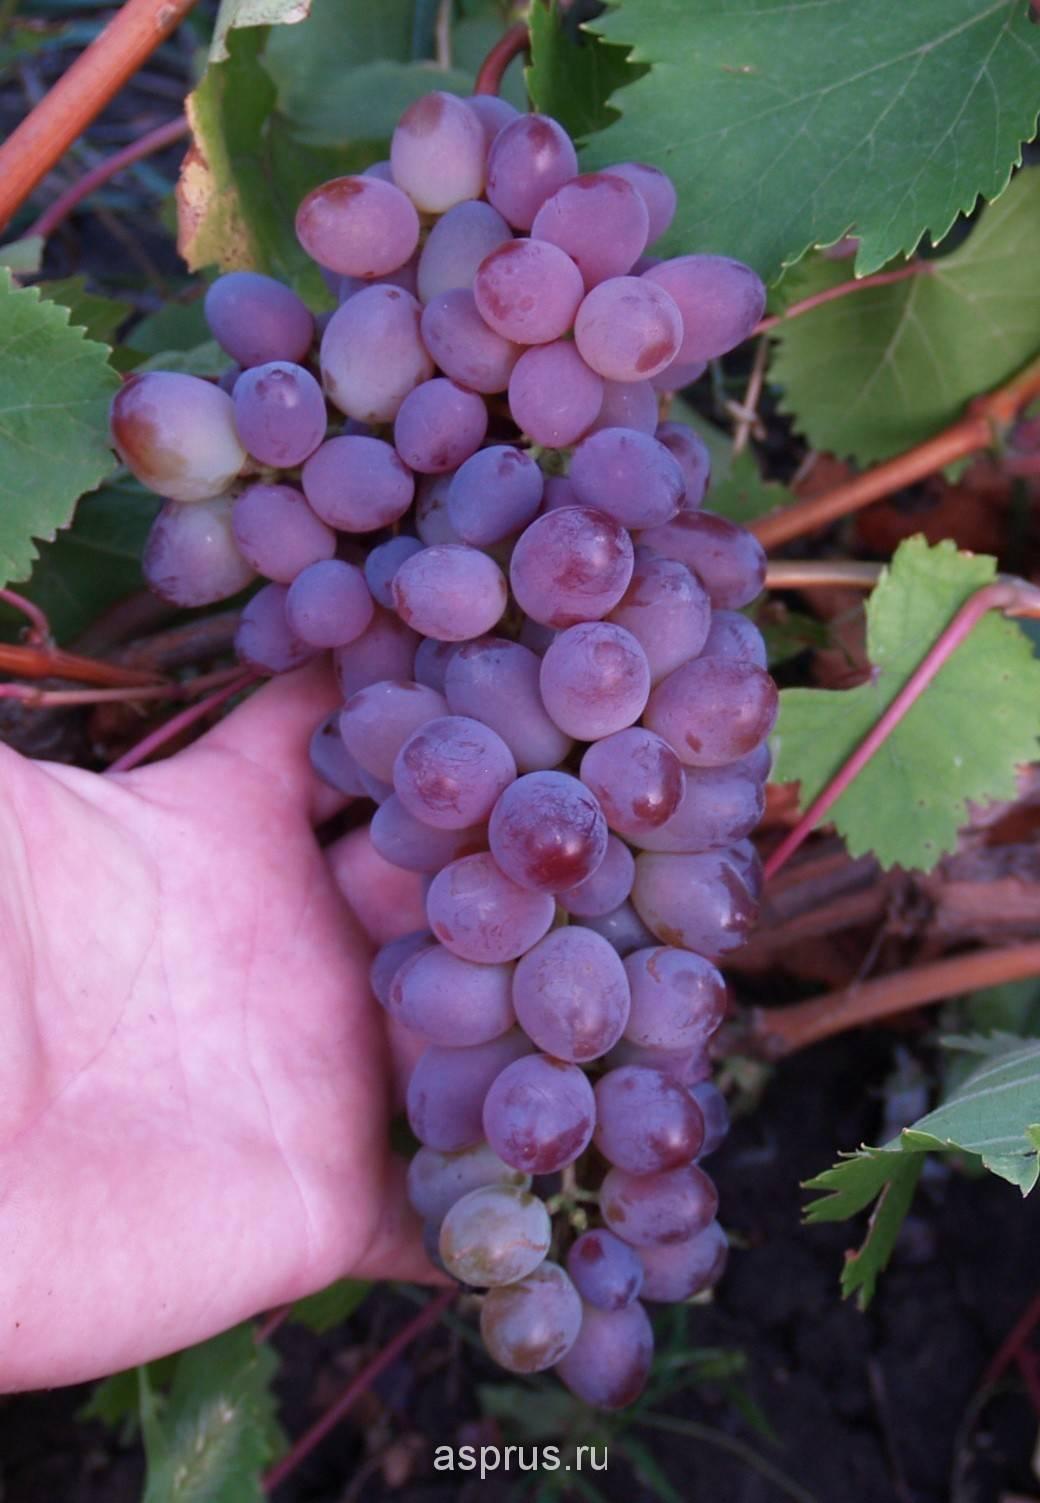 Виноград «кишмиш» и его разновидности